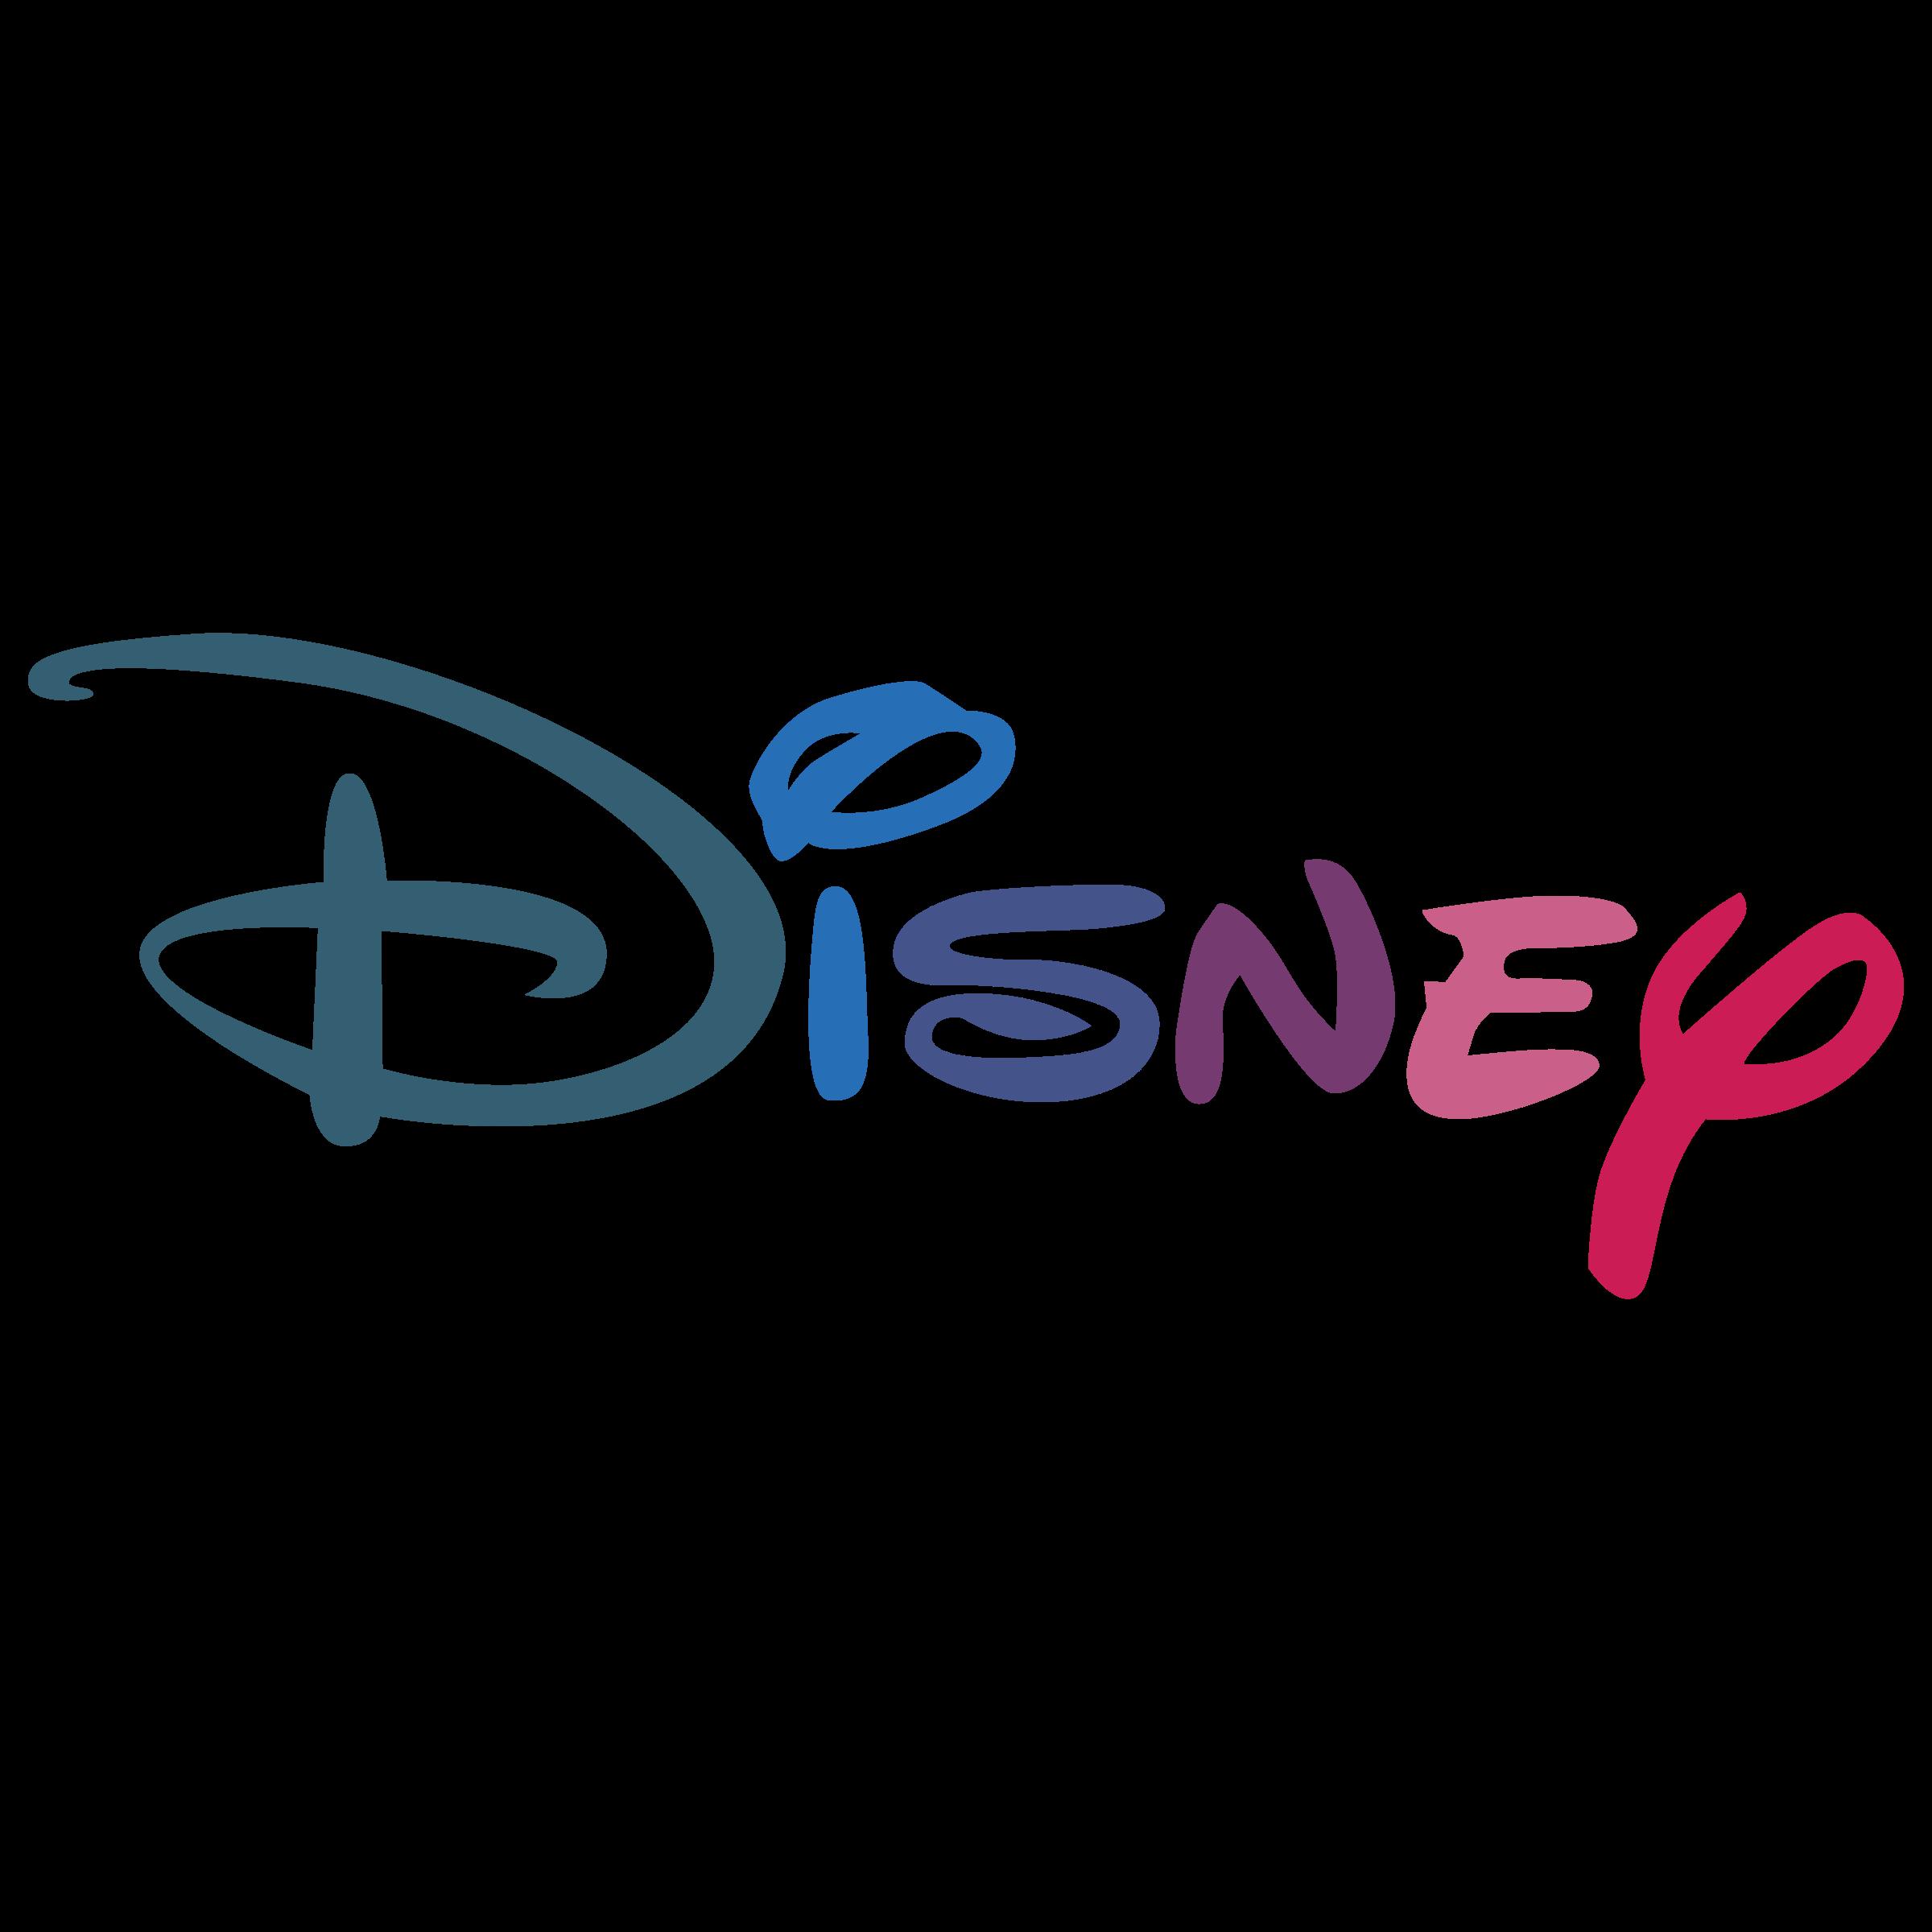 disney logo png transparent svg vector freebie supply rh freebiesupply com logo disney vectoriel disney logo vector image